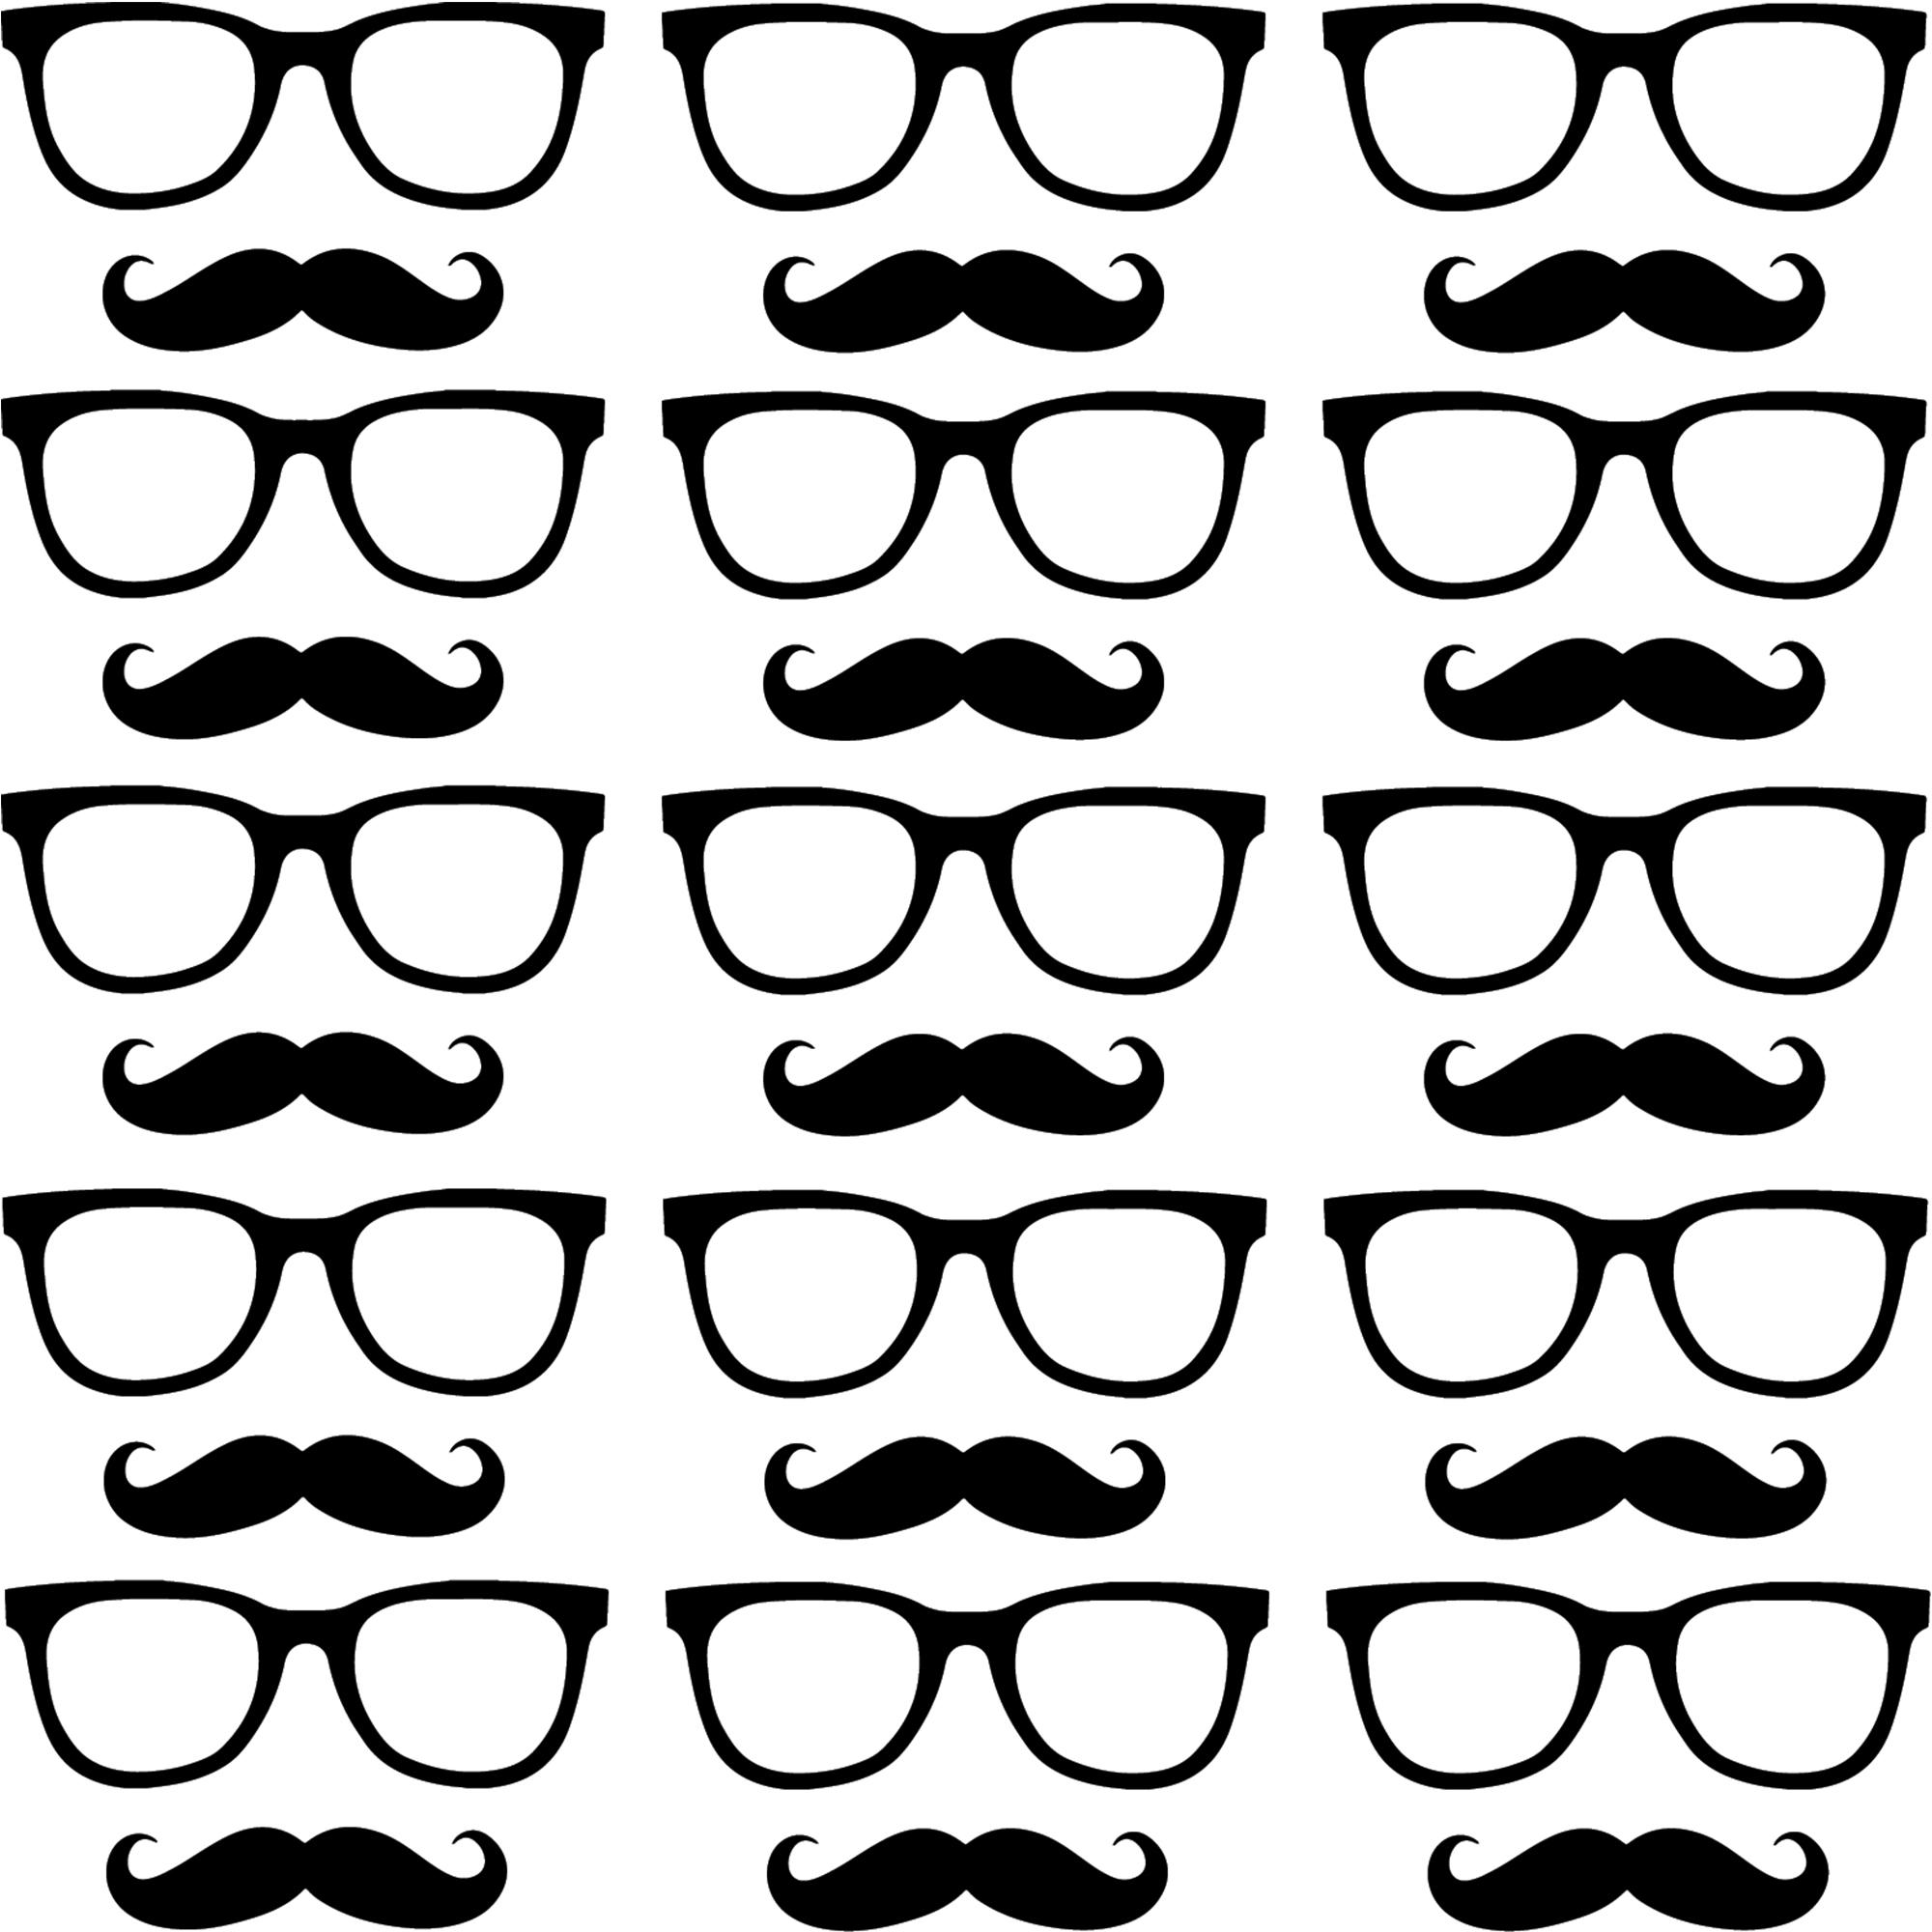 sticker motif lunettes et moustaches stickers mini stickers fun ambiance sticker. Black Bedroom Furniture Sets. Home Design Ideas